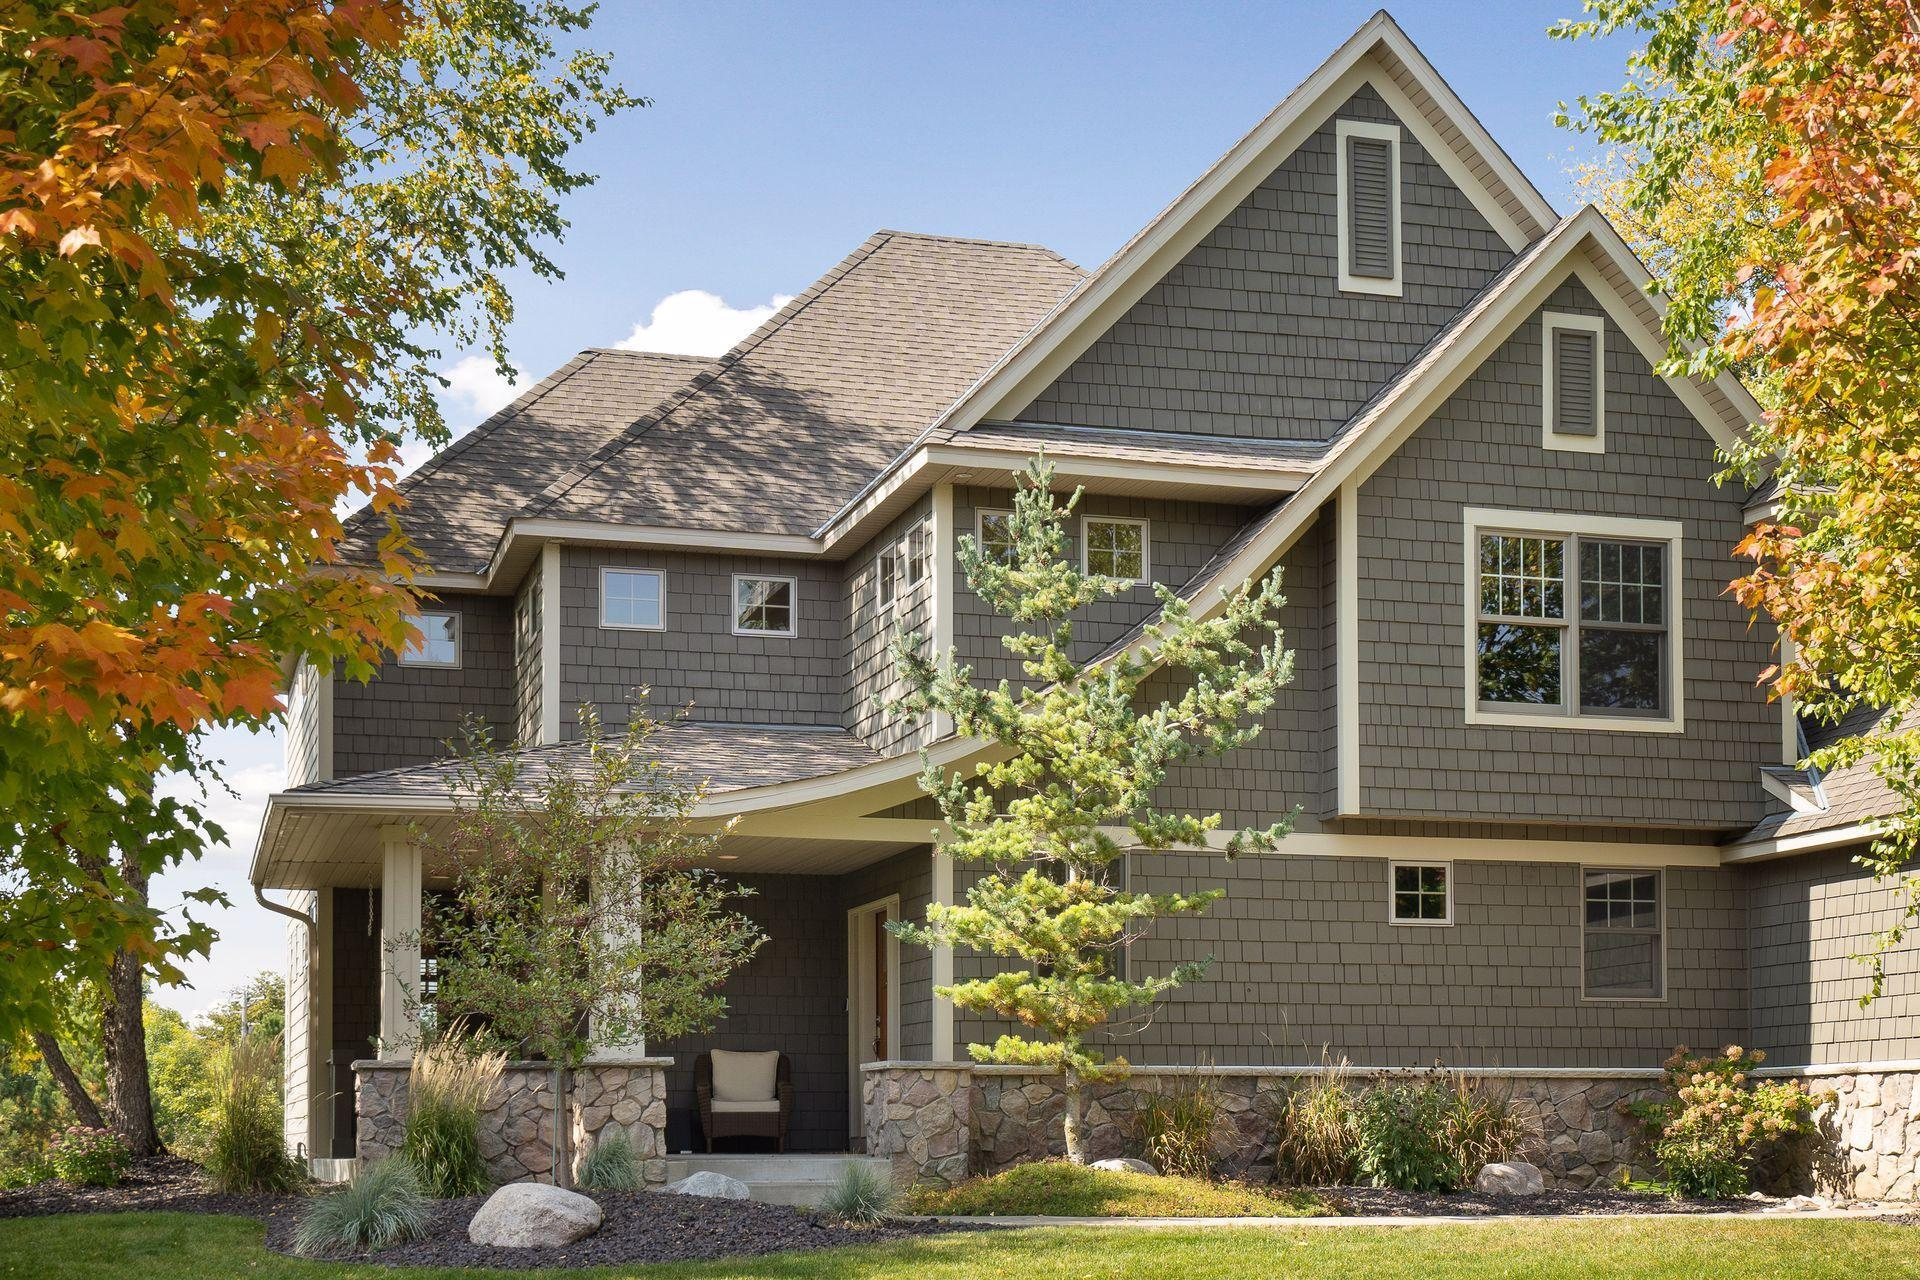 7292 Tamarack Trail Property Photo - Victoria, MN real estate listing